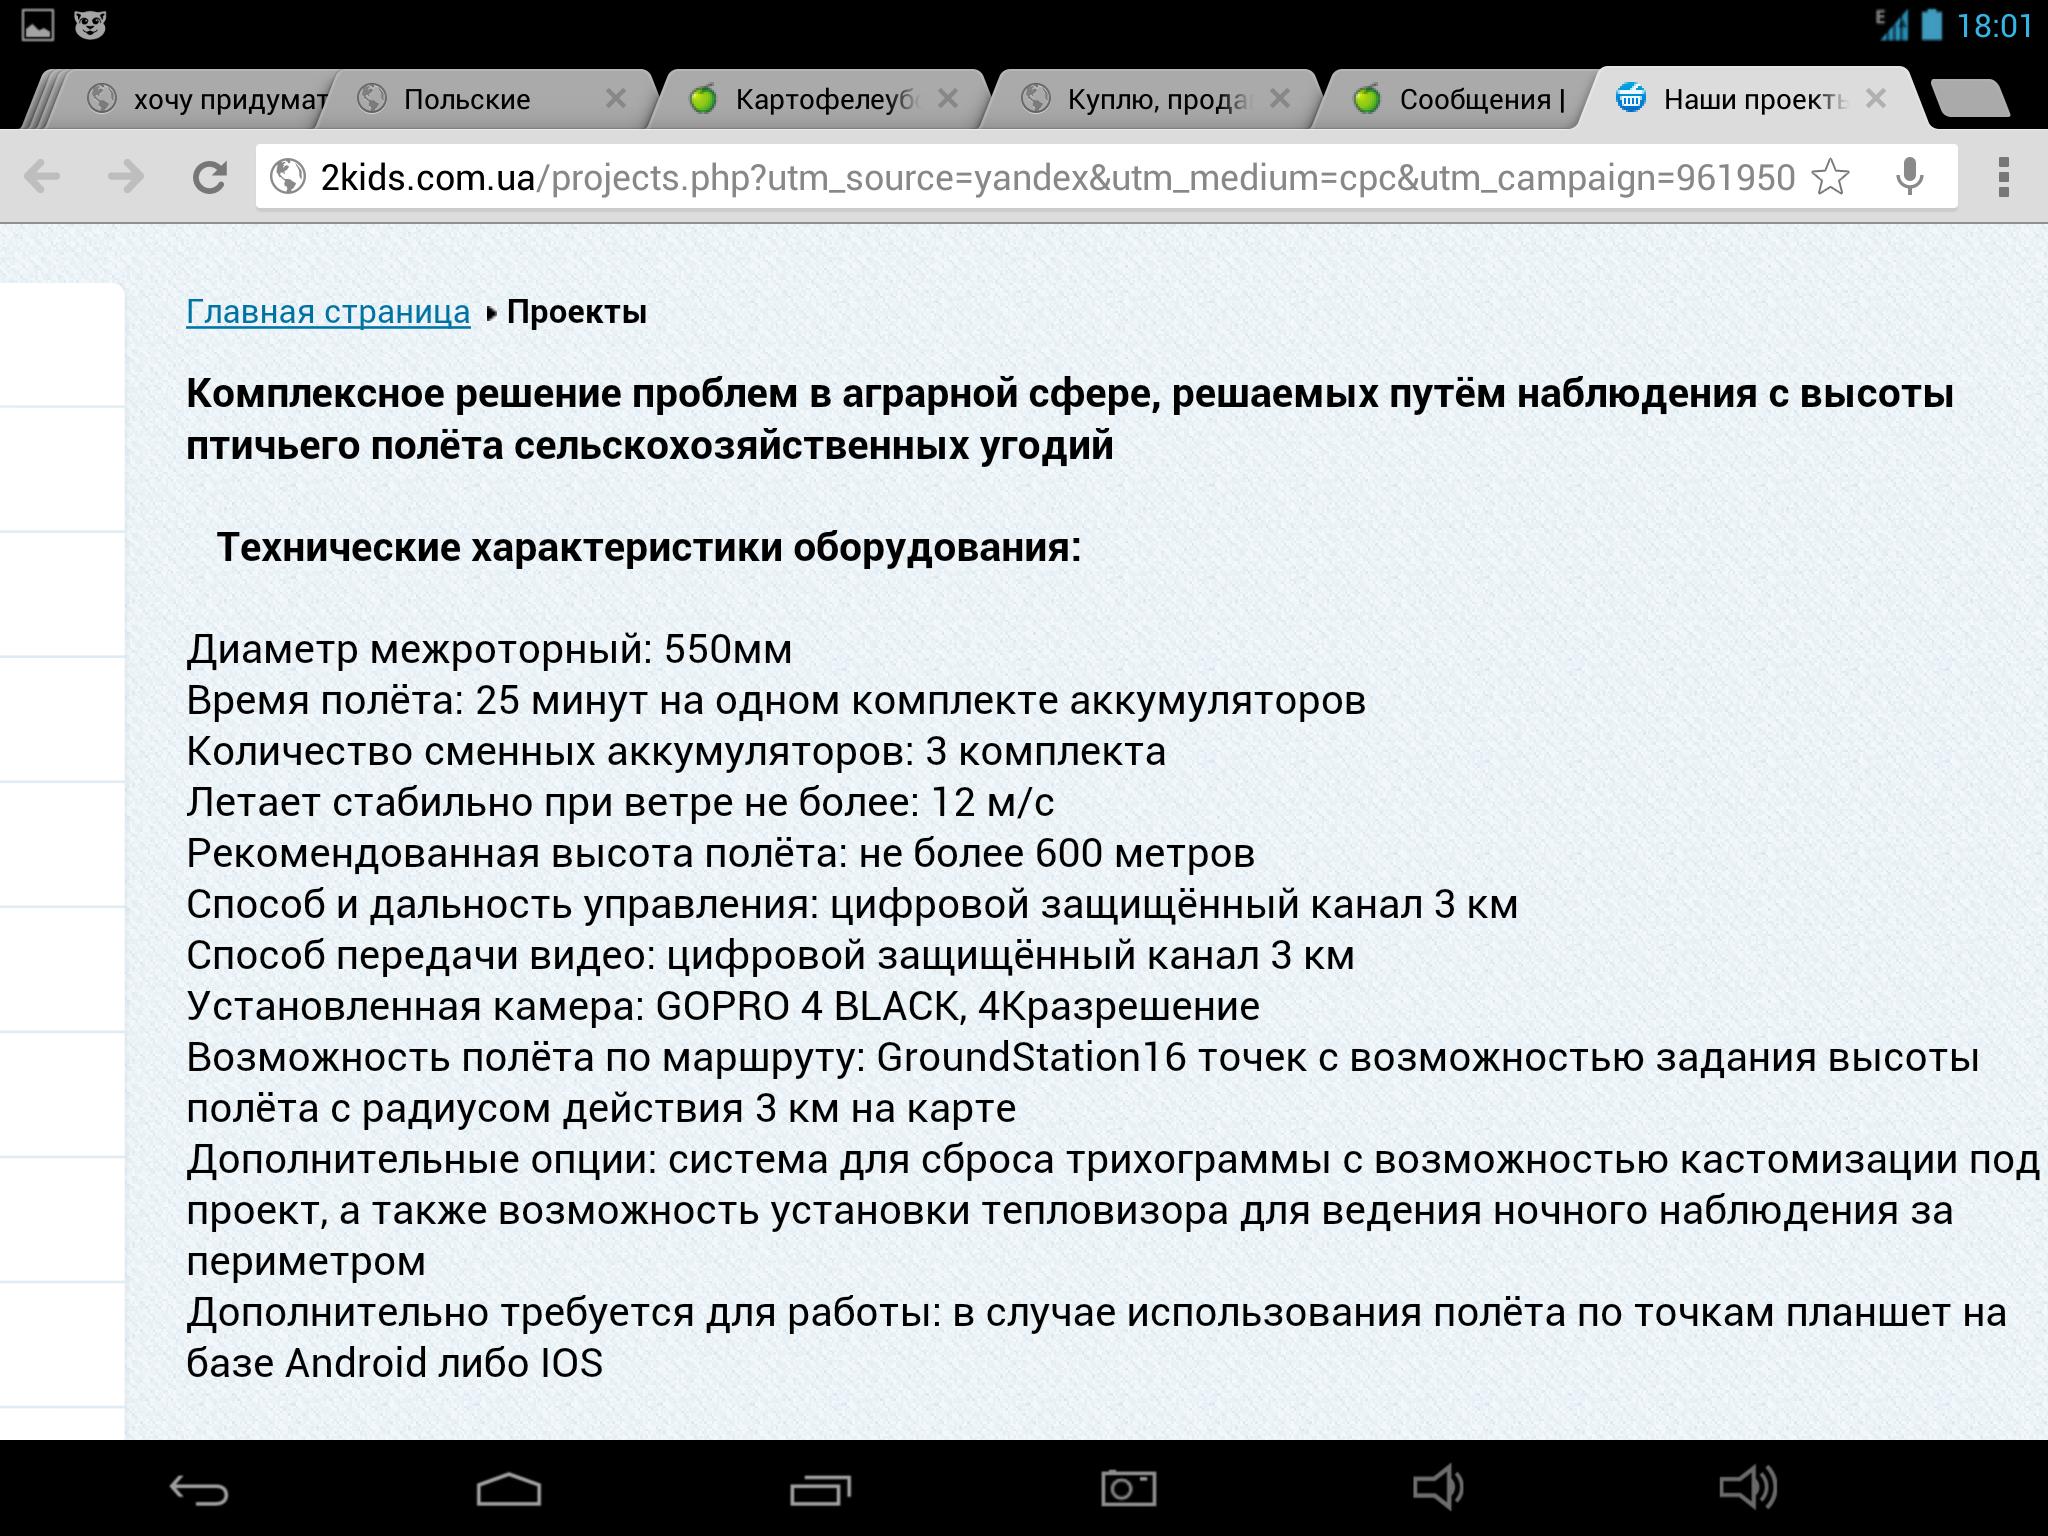 screenshot2015-11-19-18-01-27.png